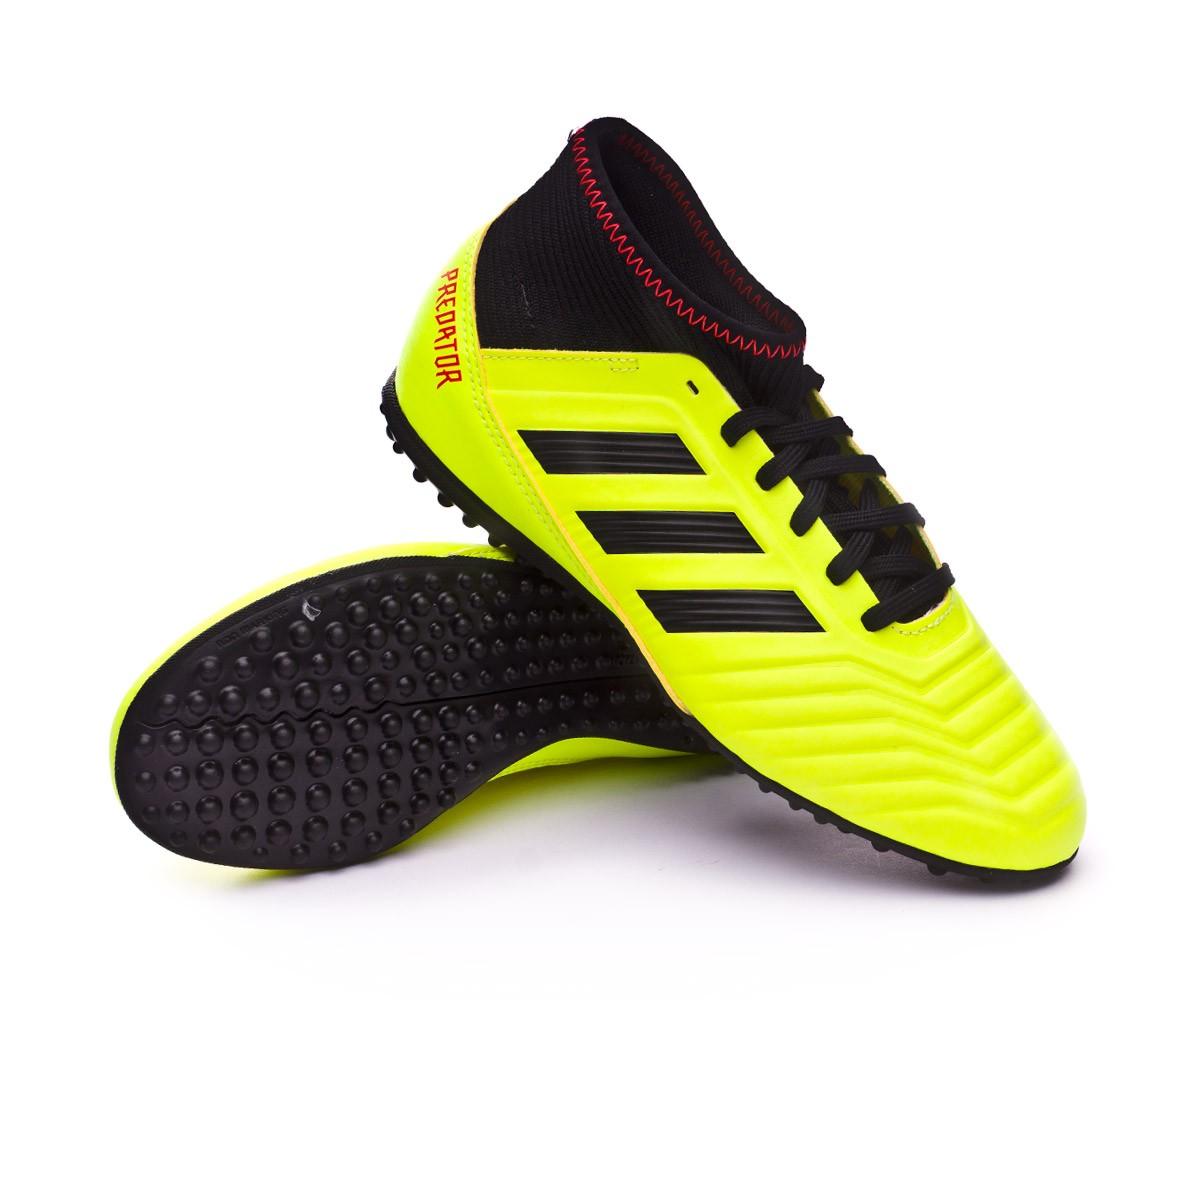 0574a828268 adidas Kids Predator Tango 18.3 Turf Football Boot. Solar yellow-Black-Solar  ...